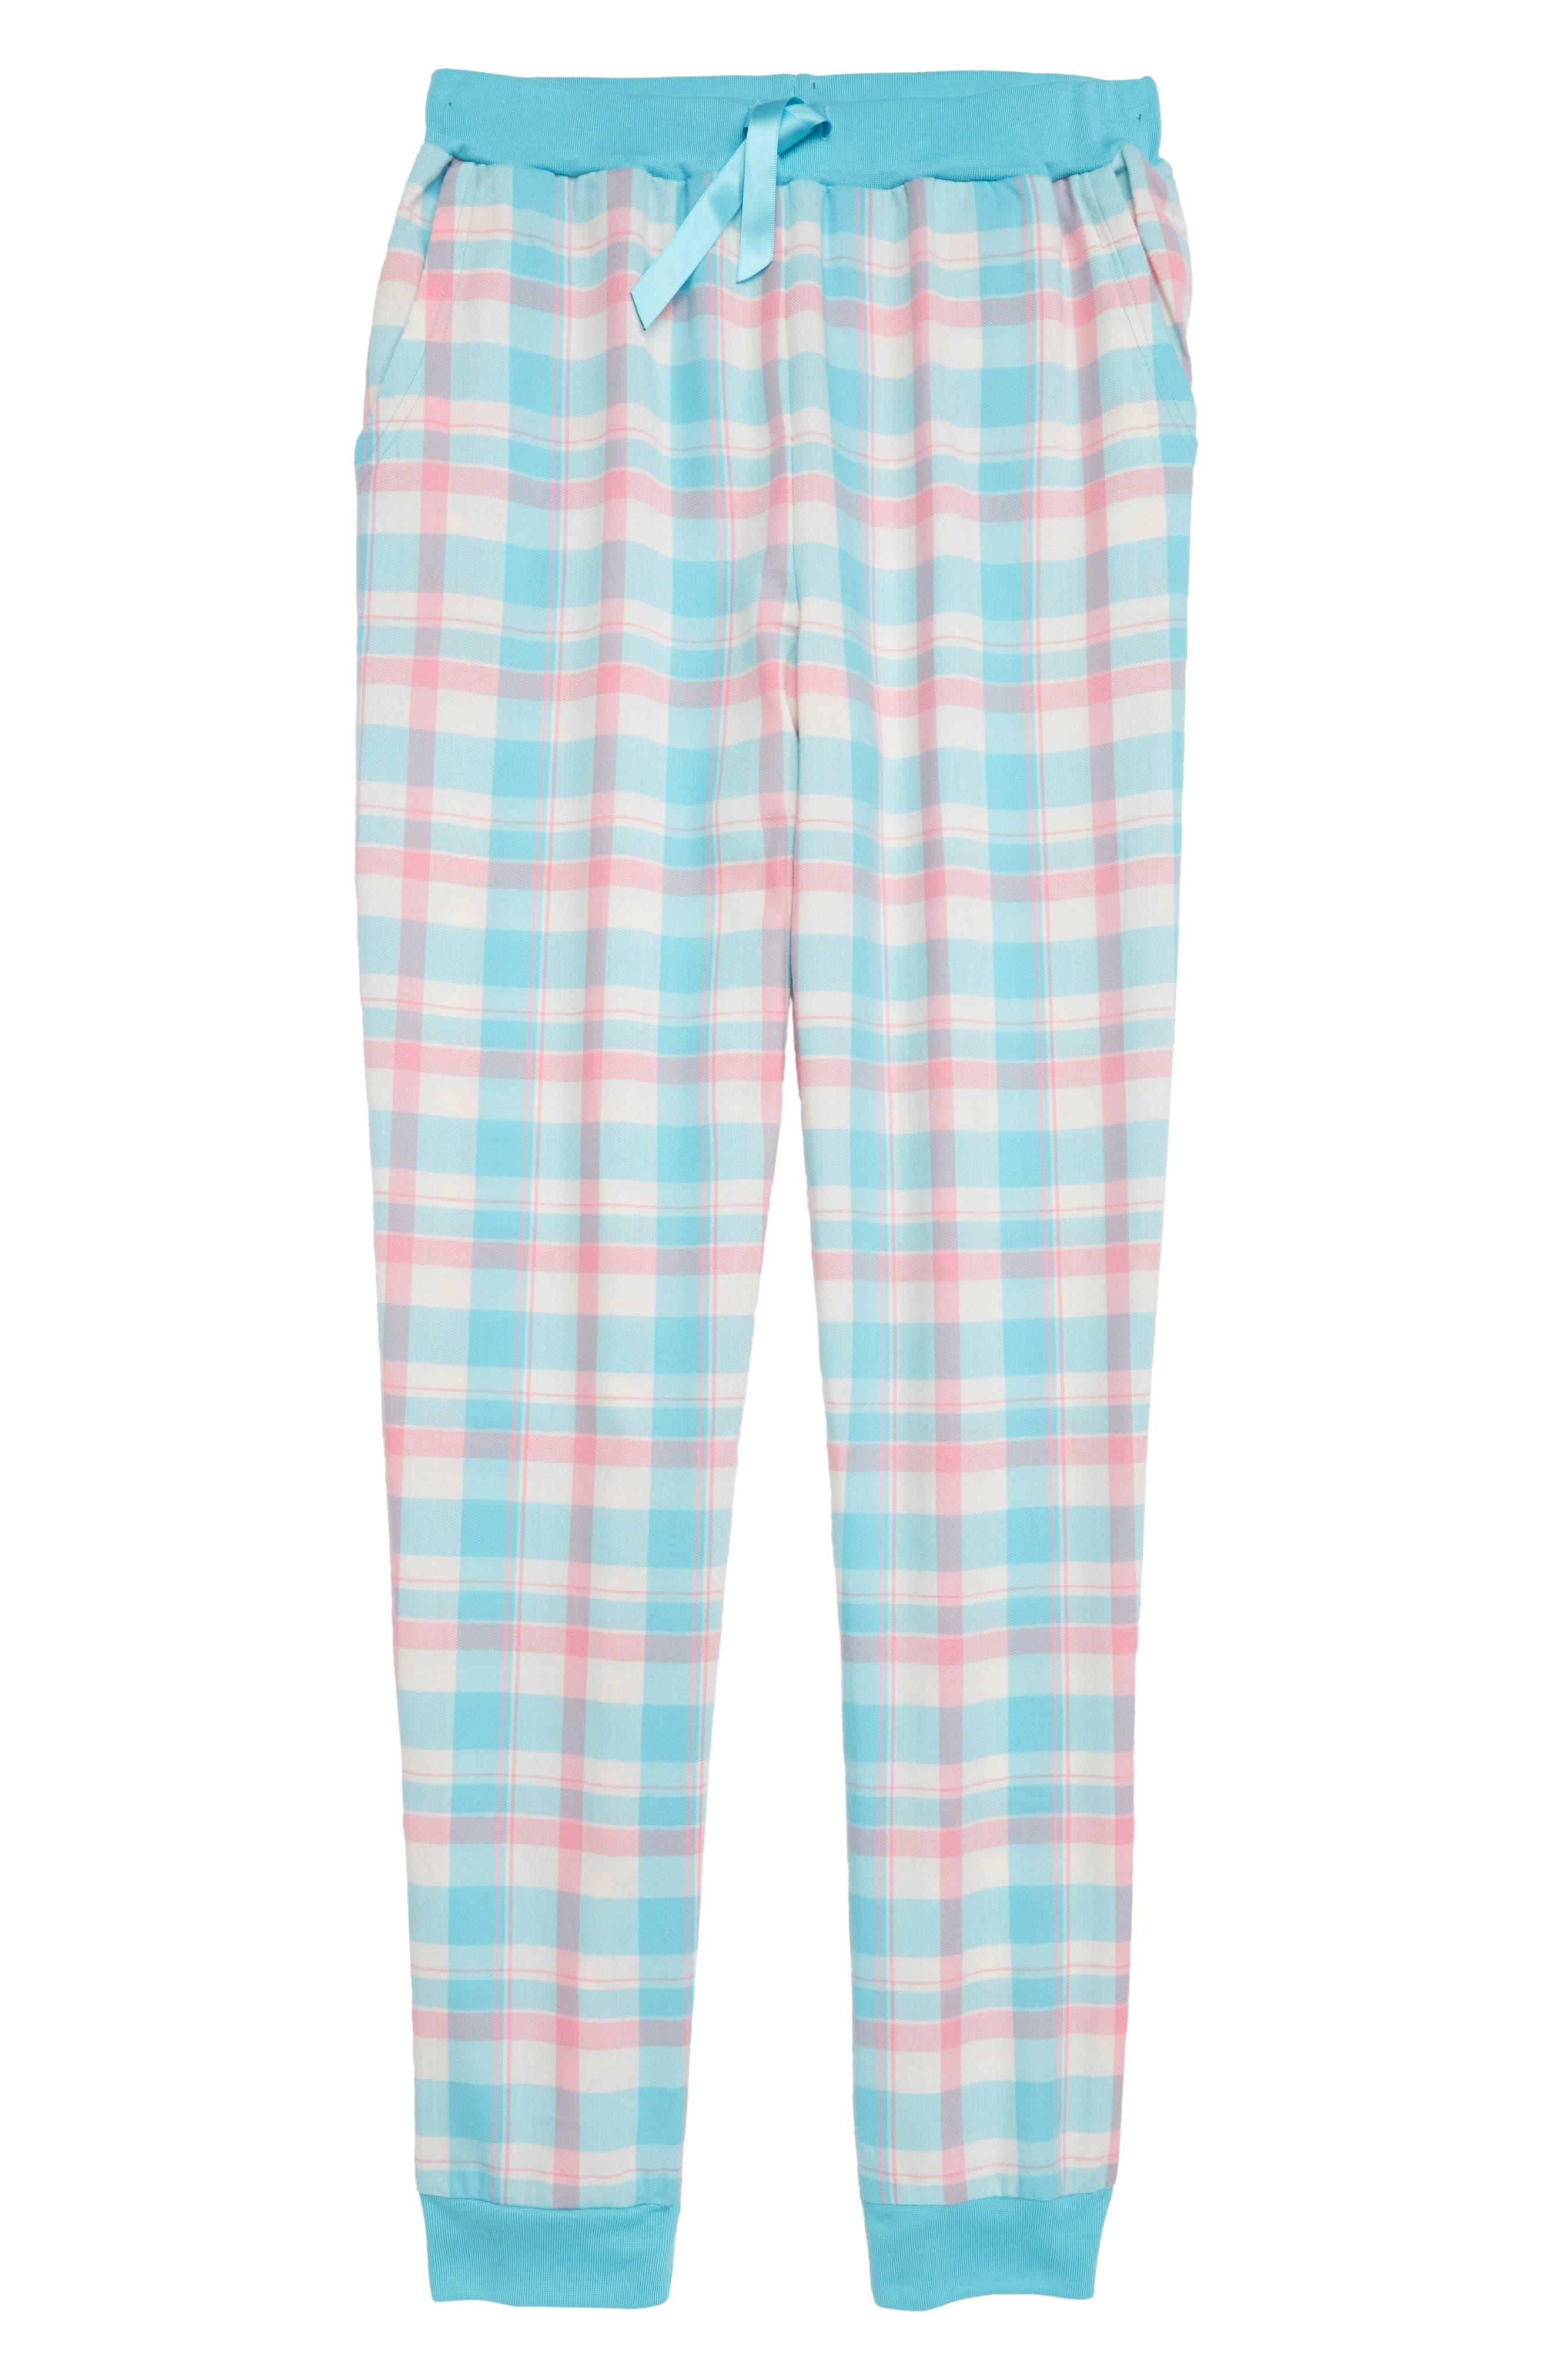 Flannel Pajama Pants,                             Main thumbnail 1, color,                             440